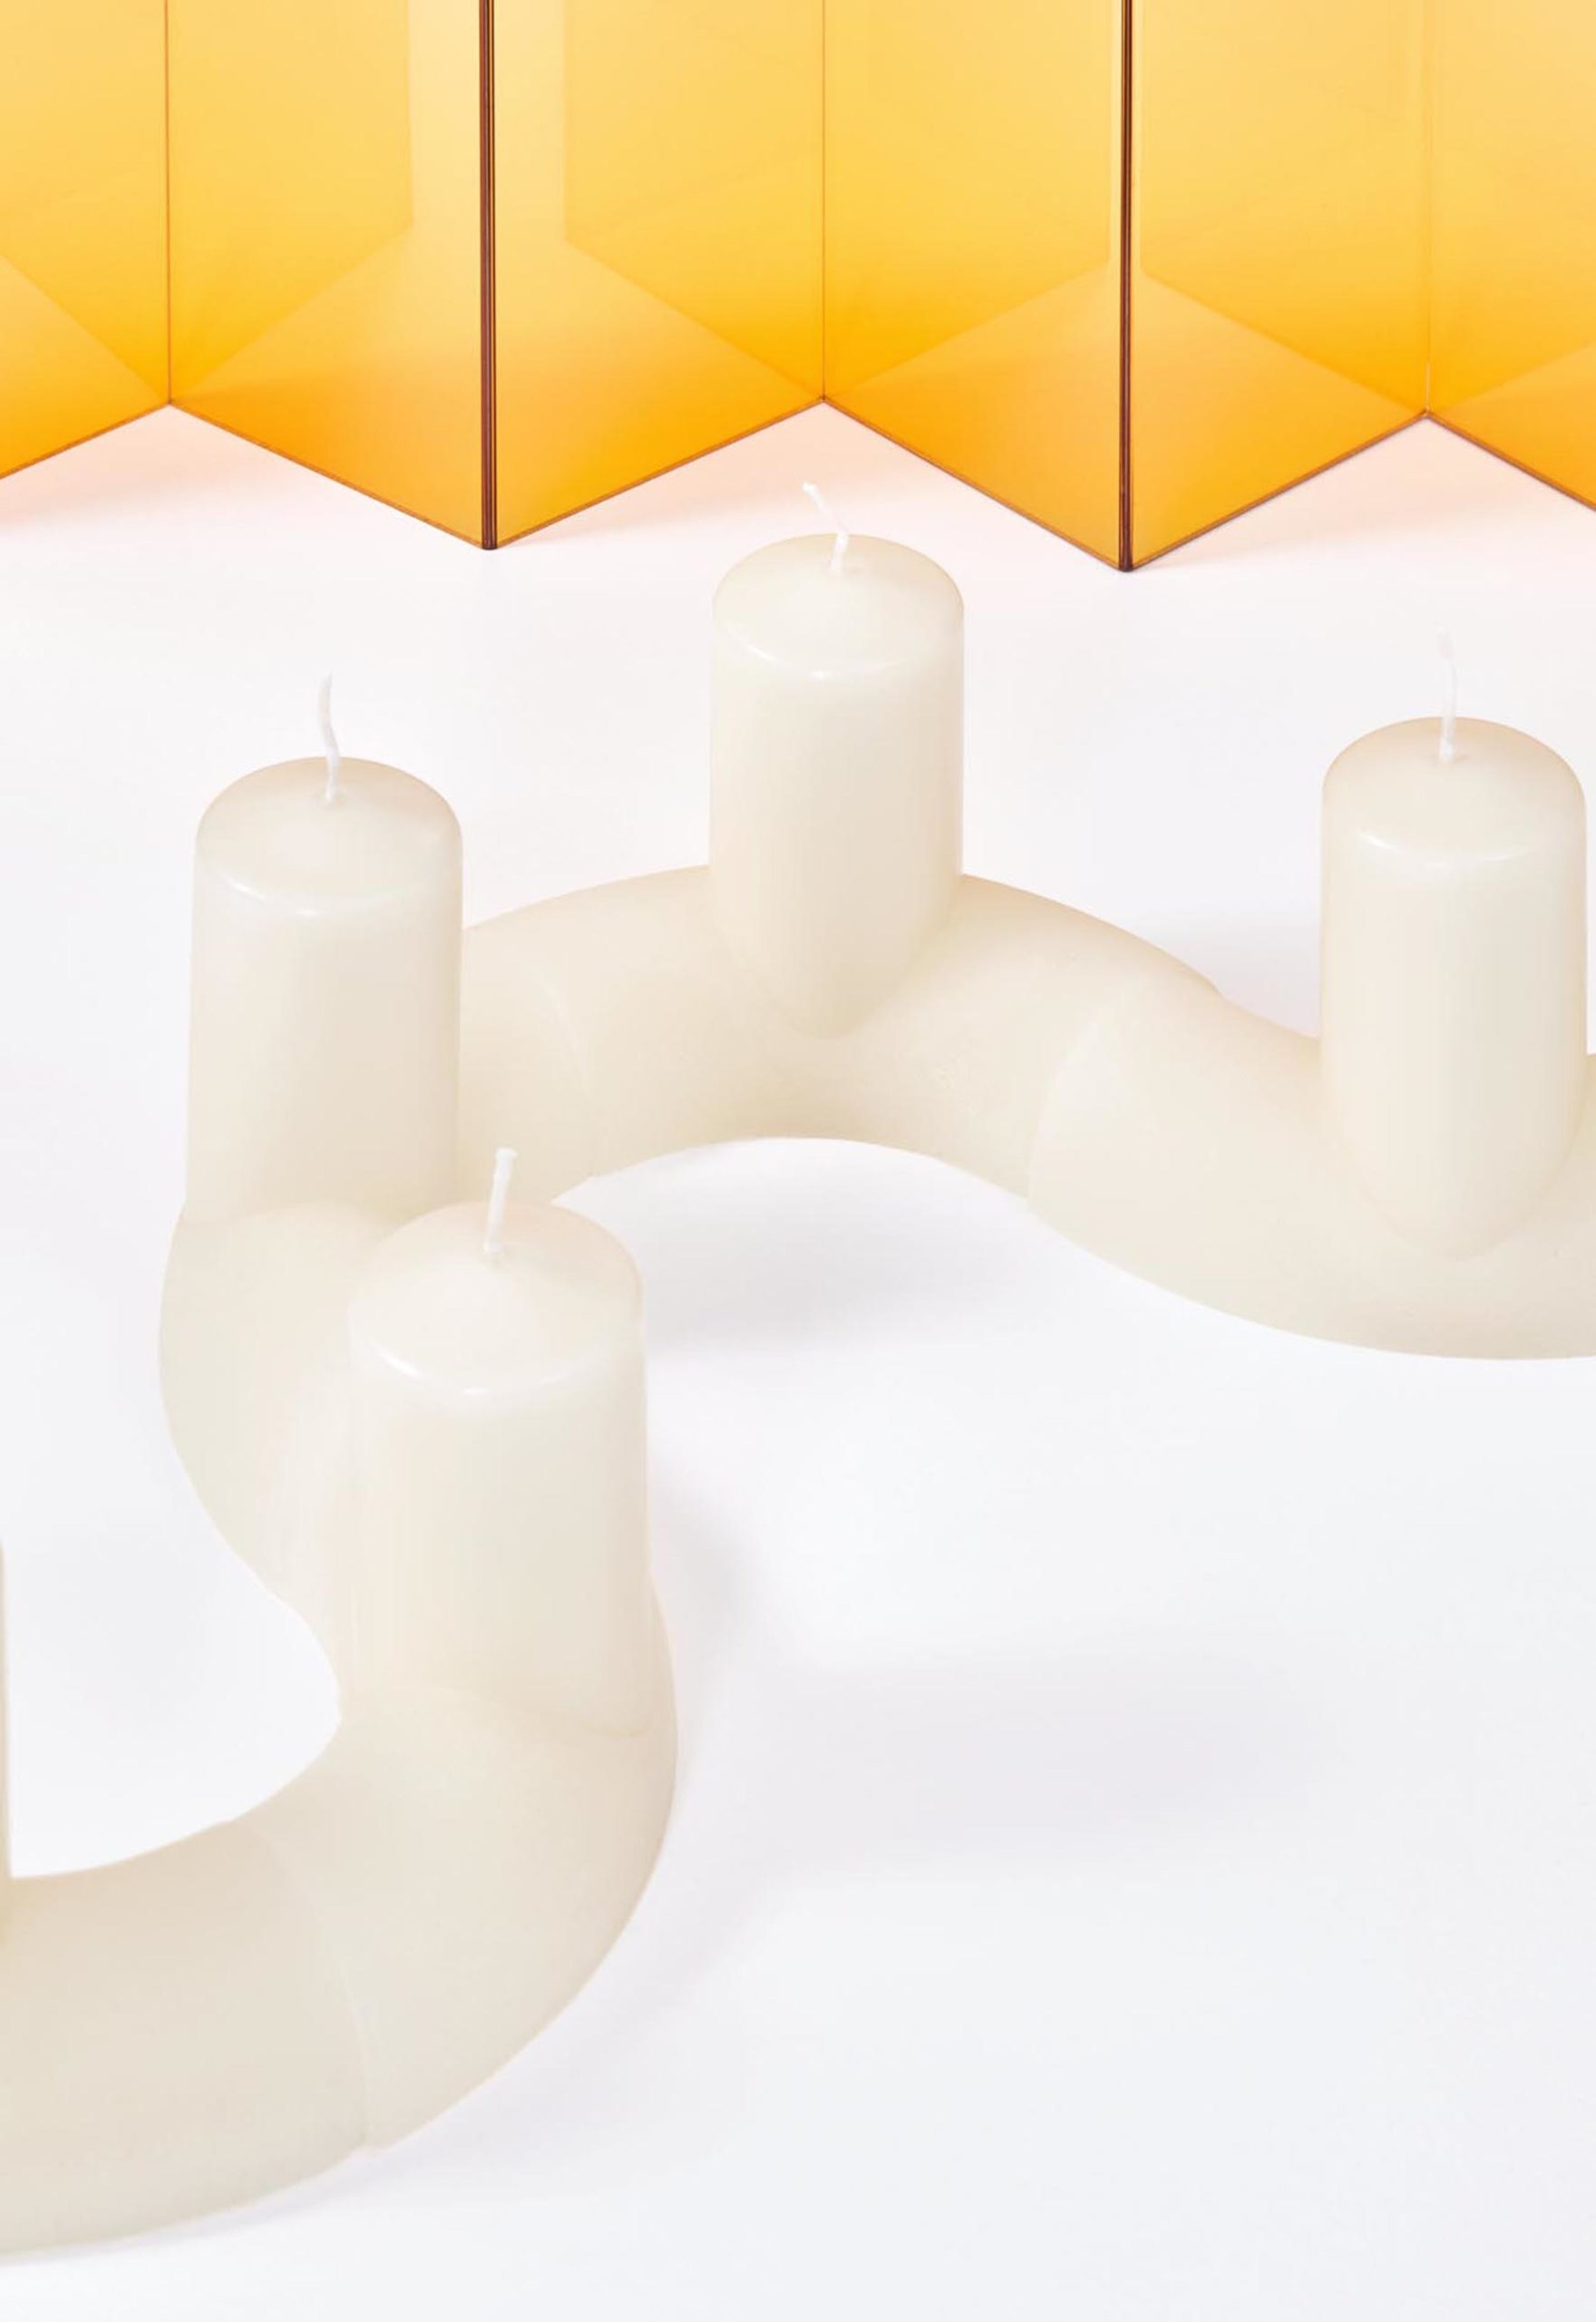 mo man tai  Quadrant Candles